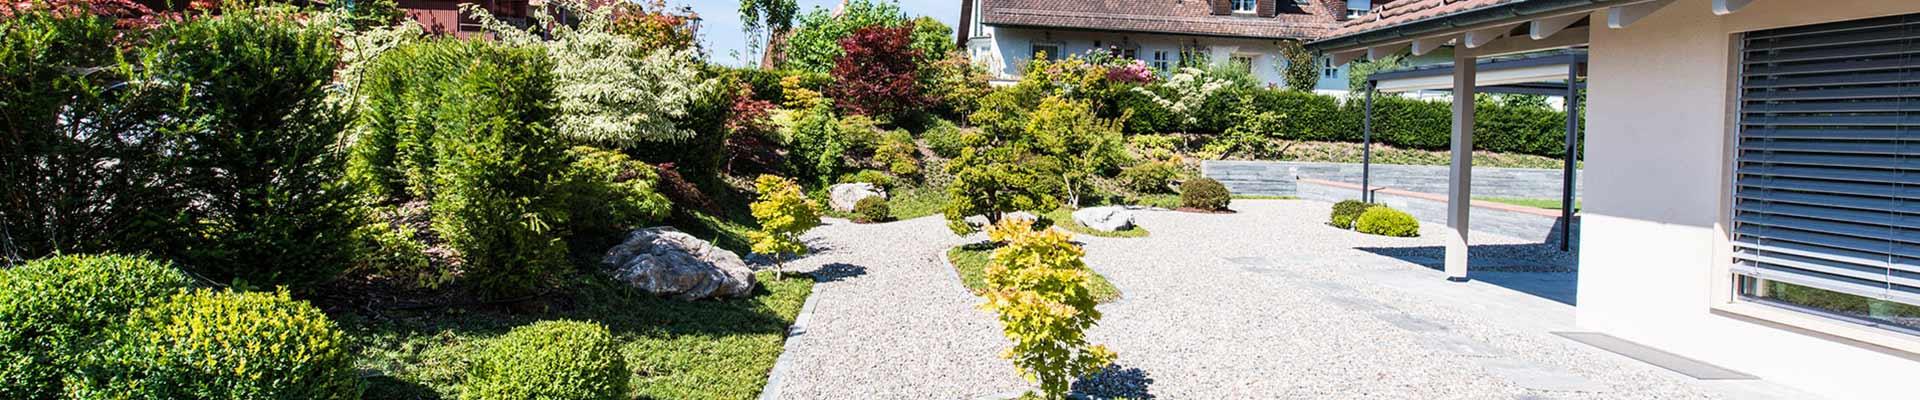 Gartenbau moderner Garten